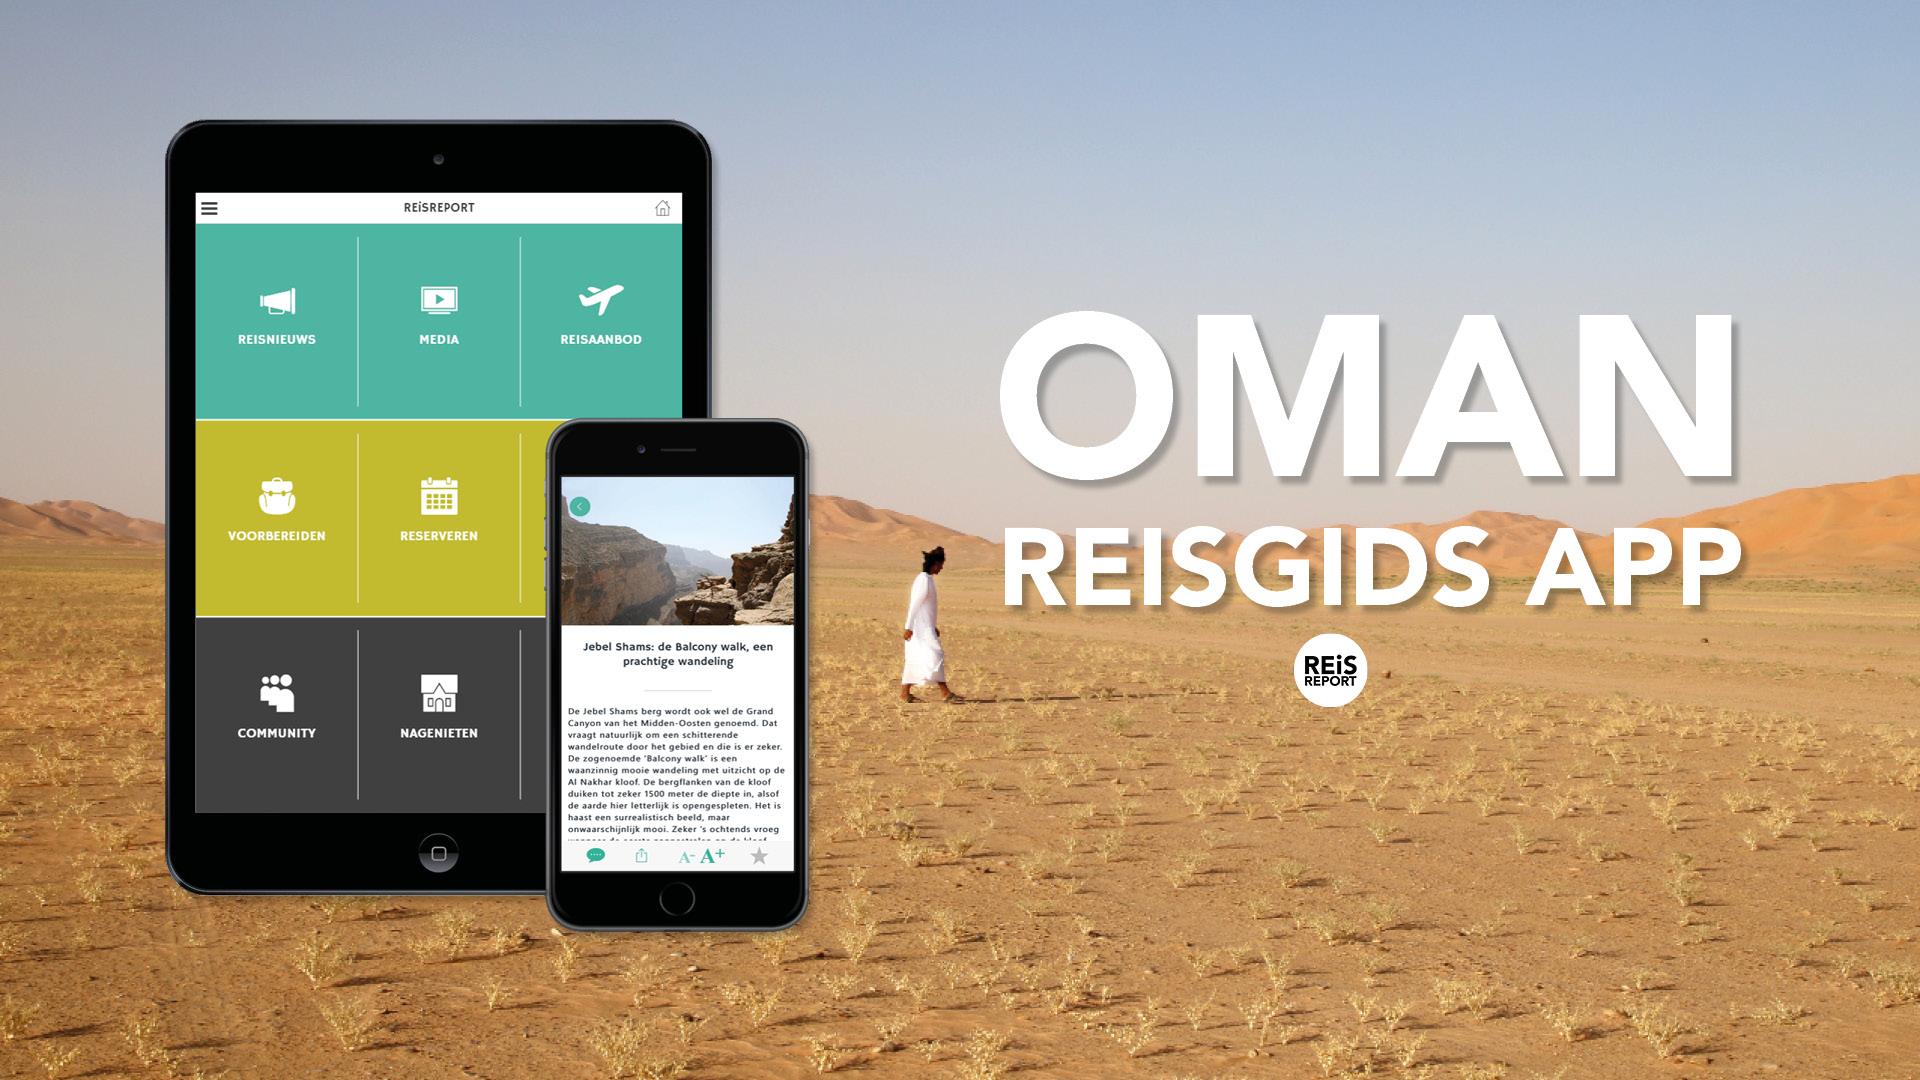 Oman reisgids